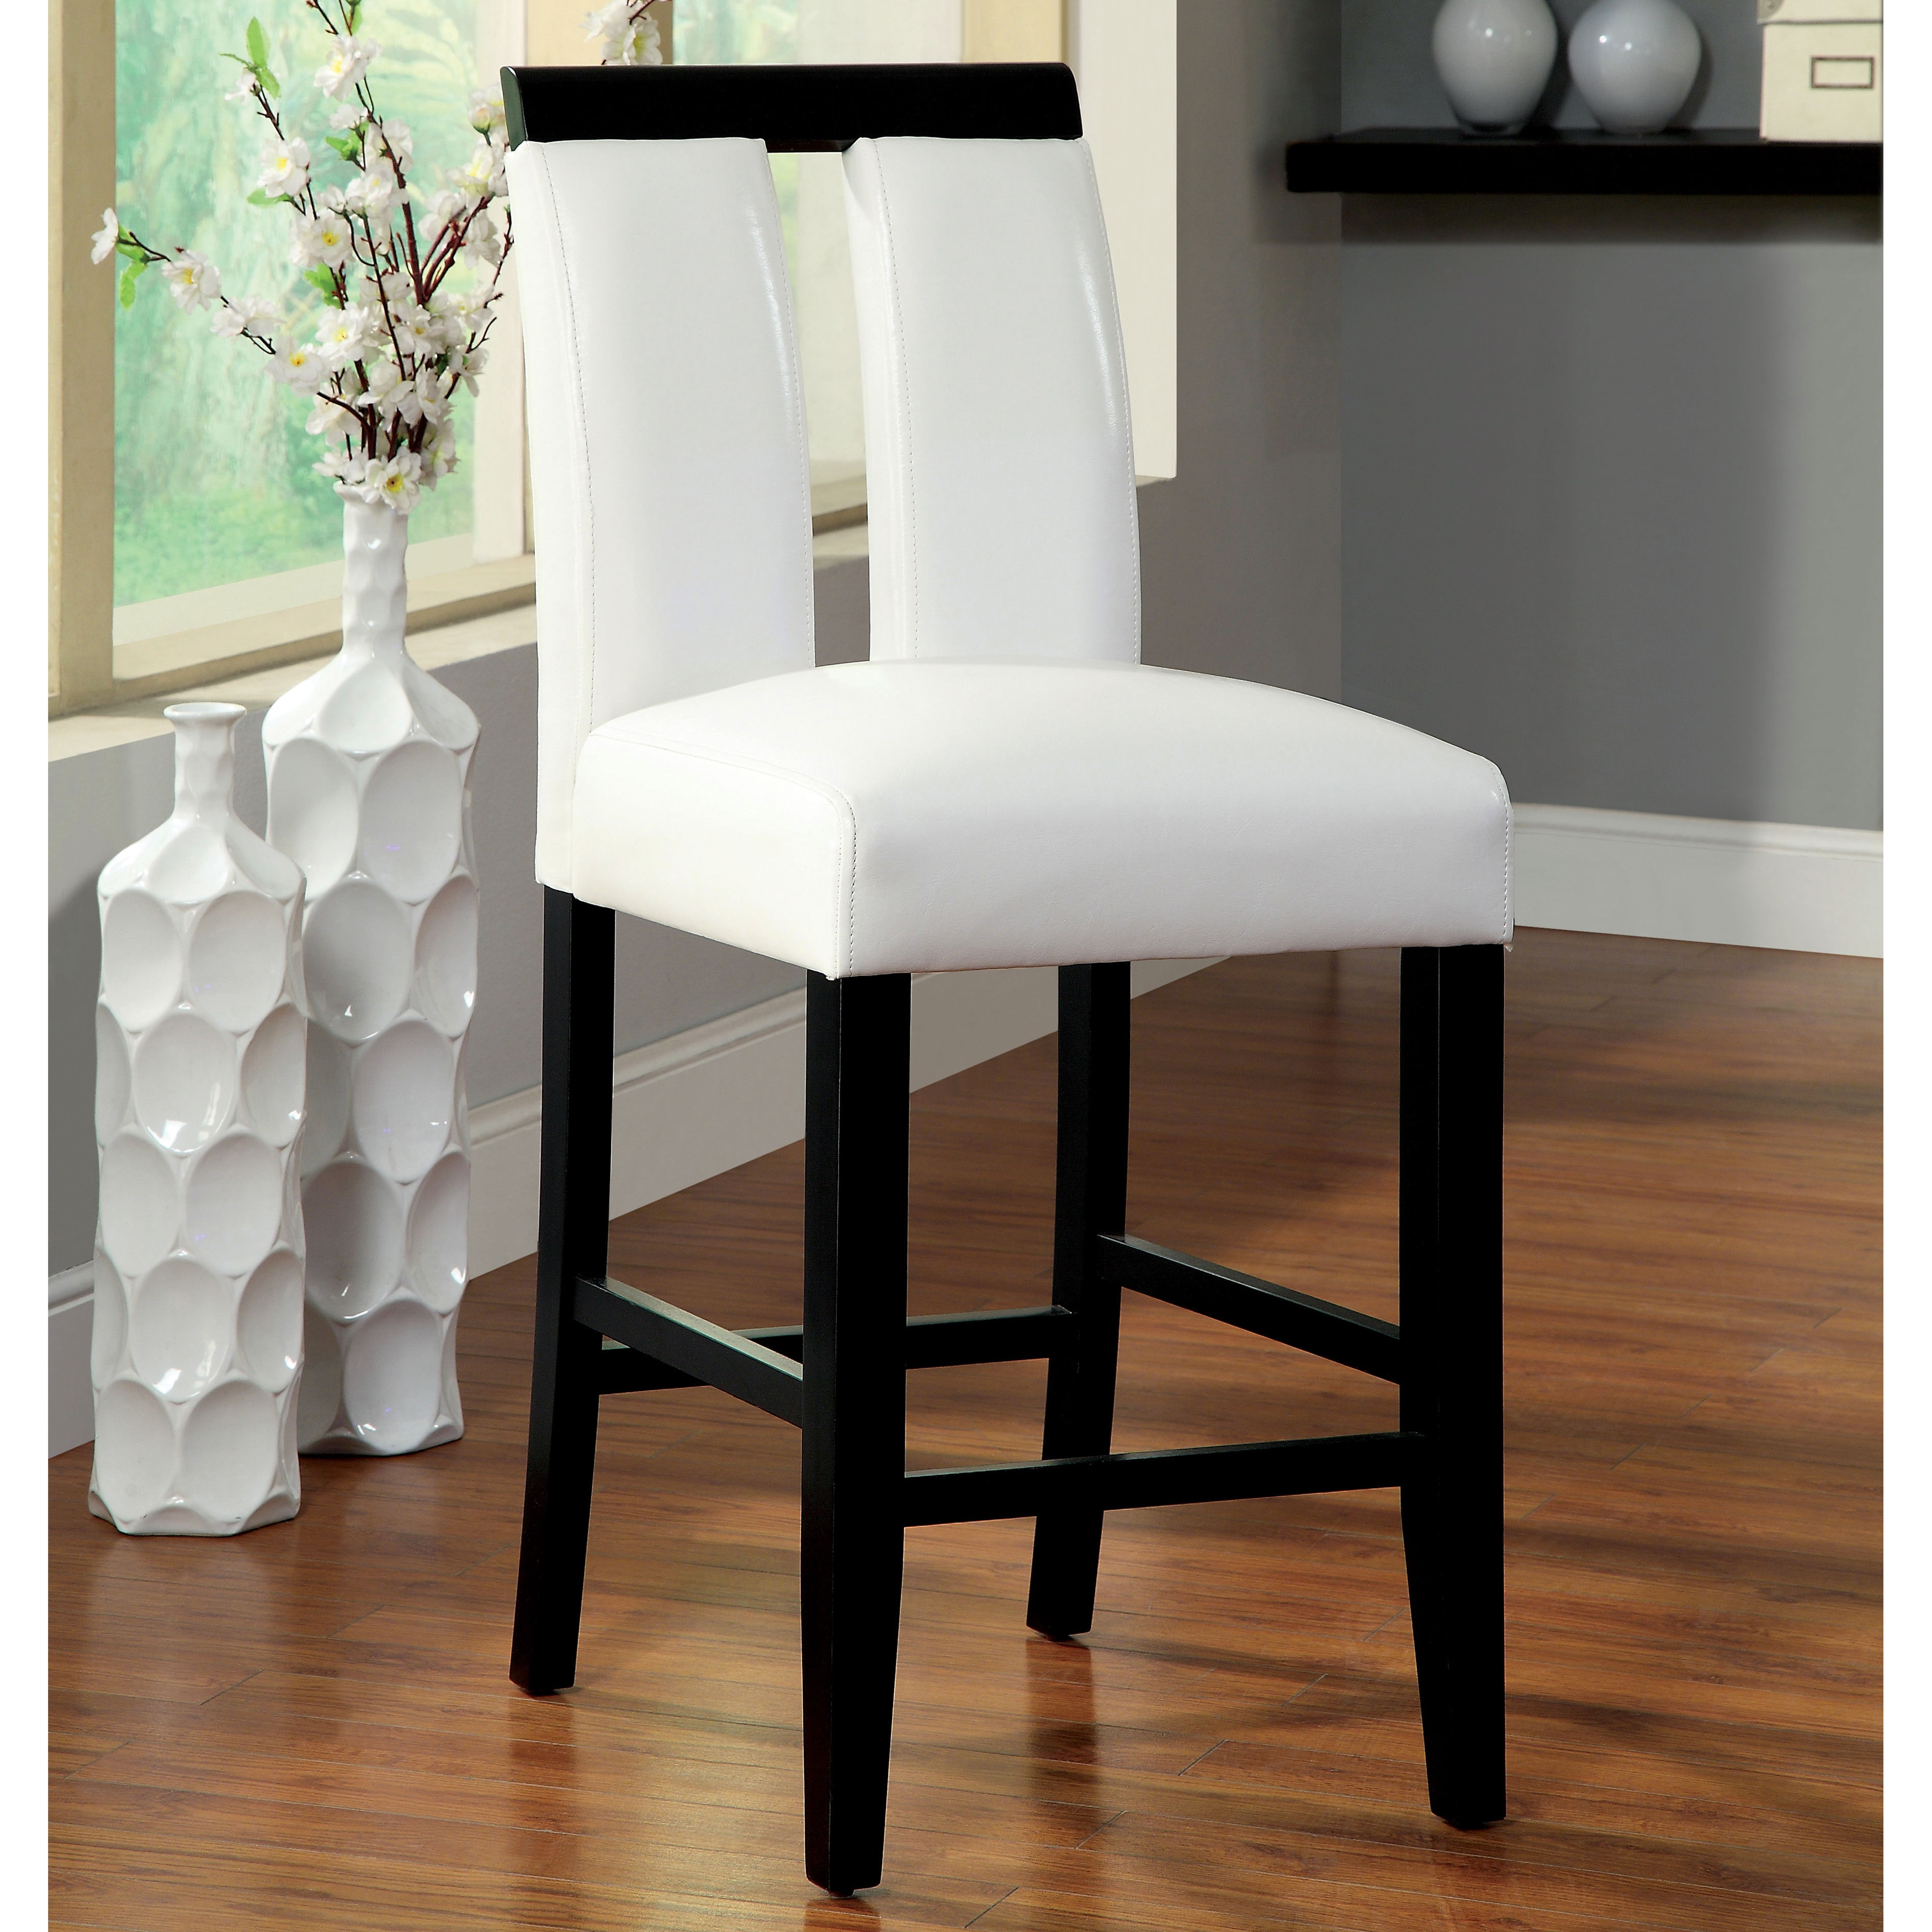 Shop Furniture Of America Lumina Two Tone Counter Height